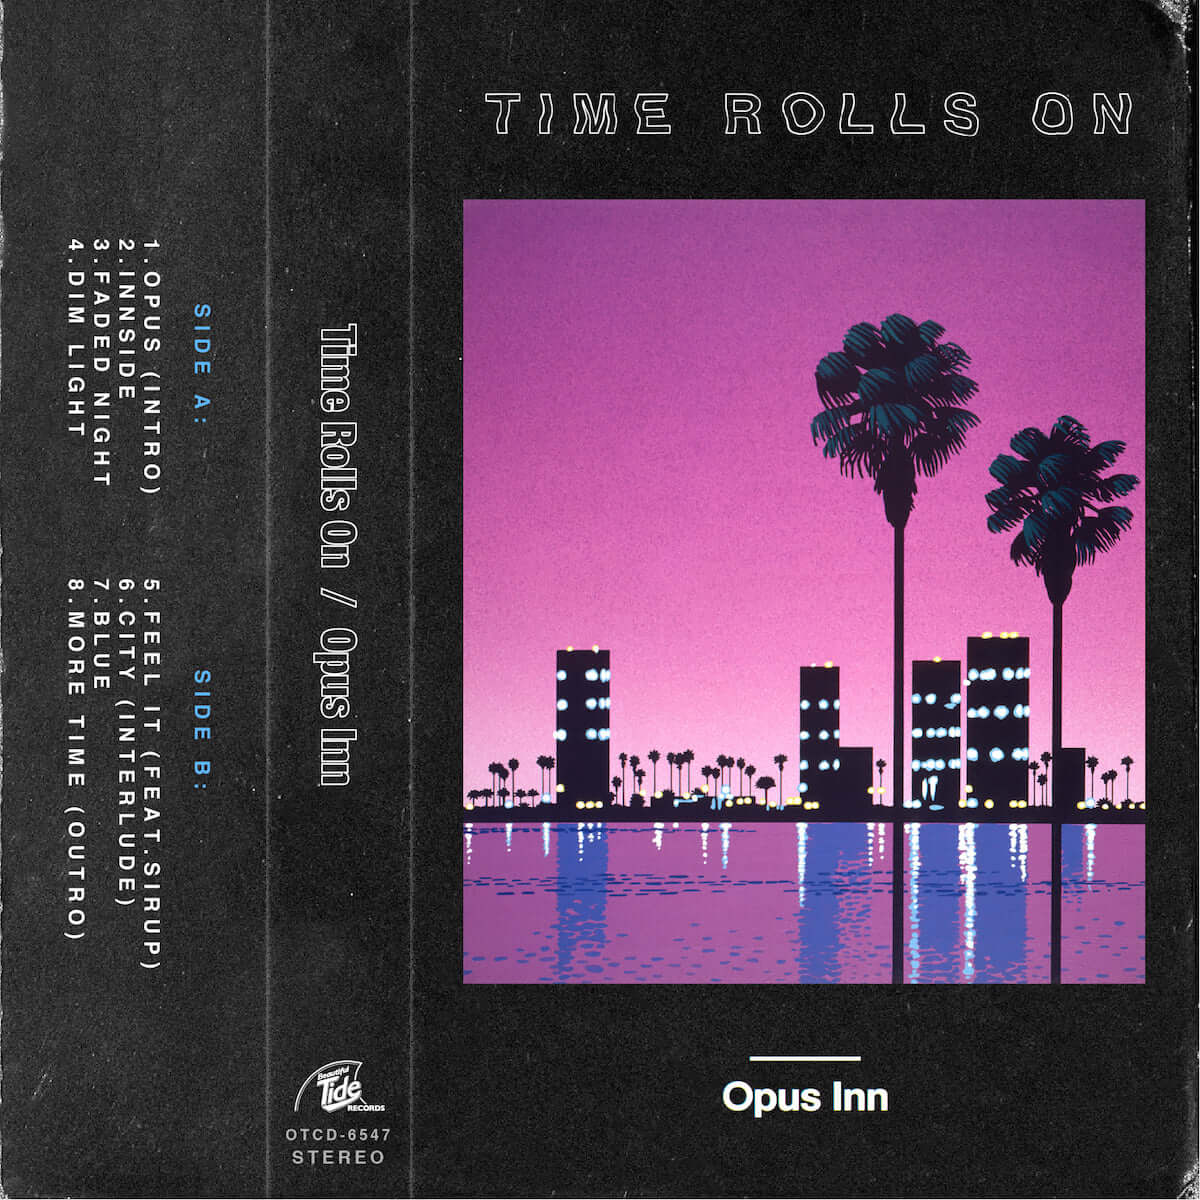 Opus InnがSIRUPをフィーチャーした楽曲「Feel It」のMVを公開 12月にはhotel koé tokyoにてリリパも開催 music181115-opusinn-4-1200x1200